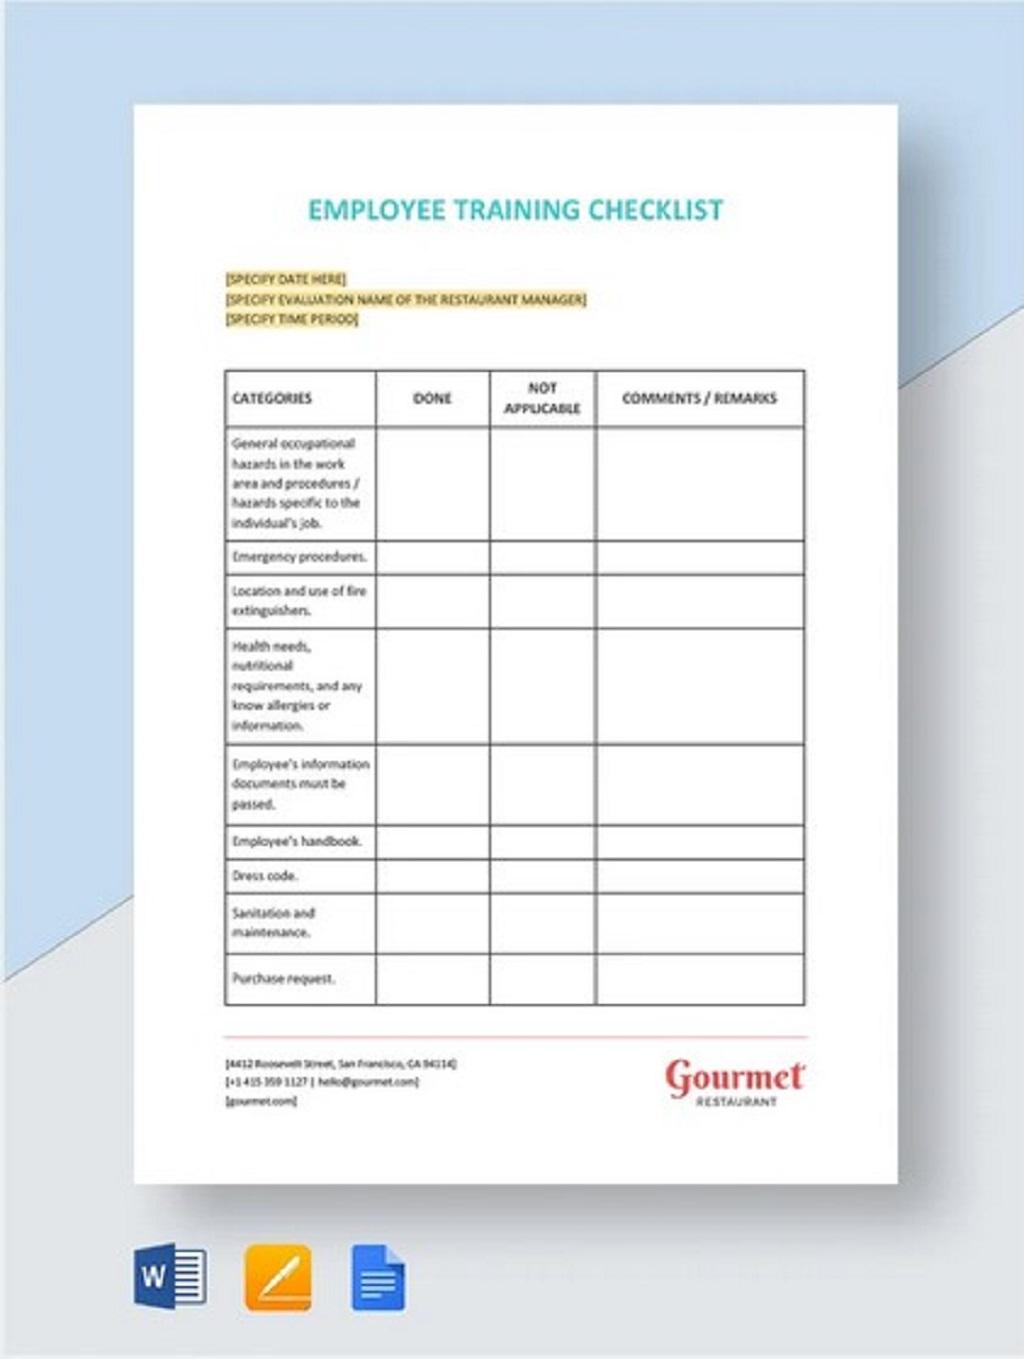 Restaurant Employee Training Checklist Word Pdf Template Google Docs  Samples Large